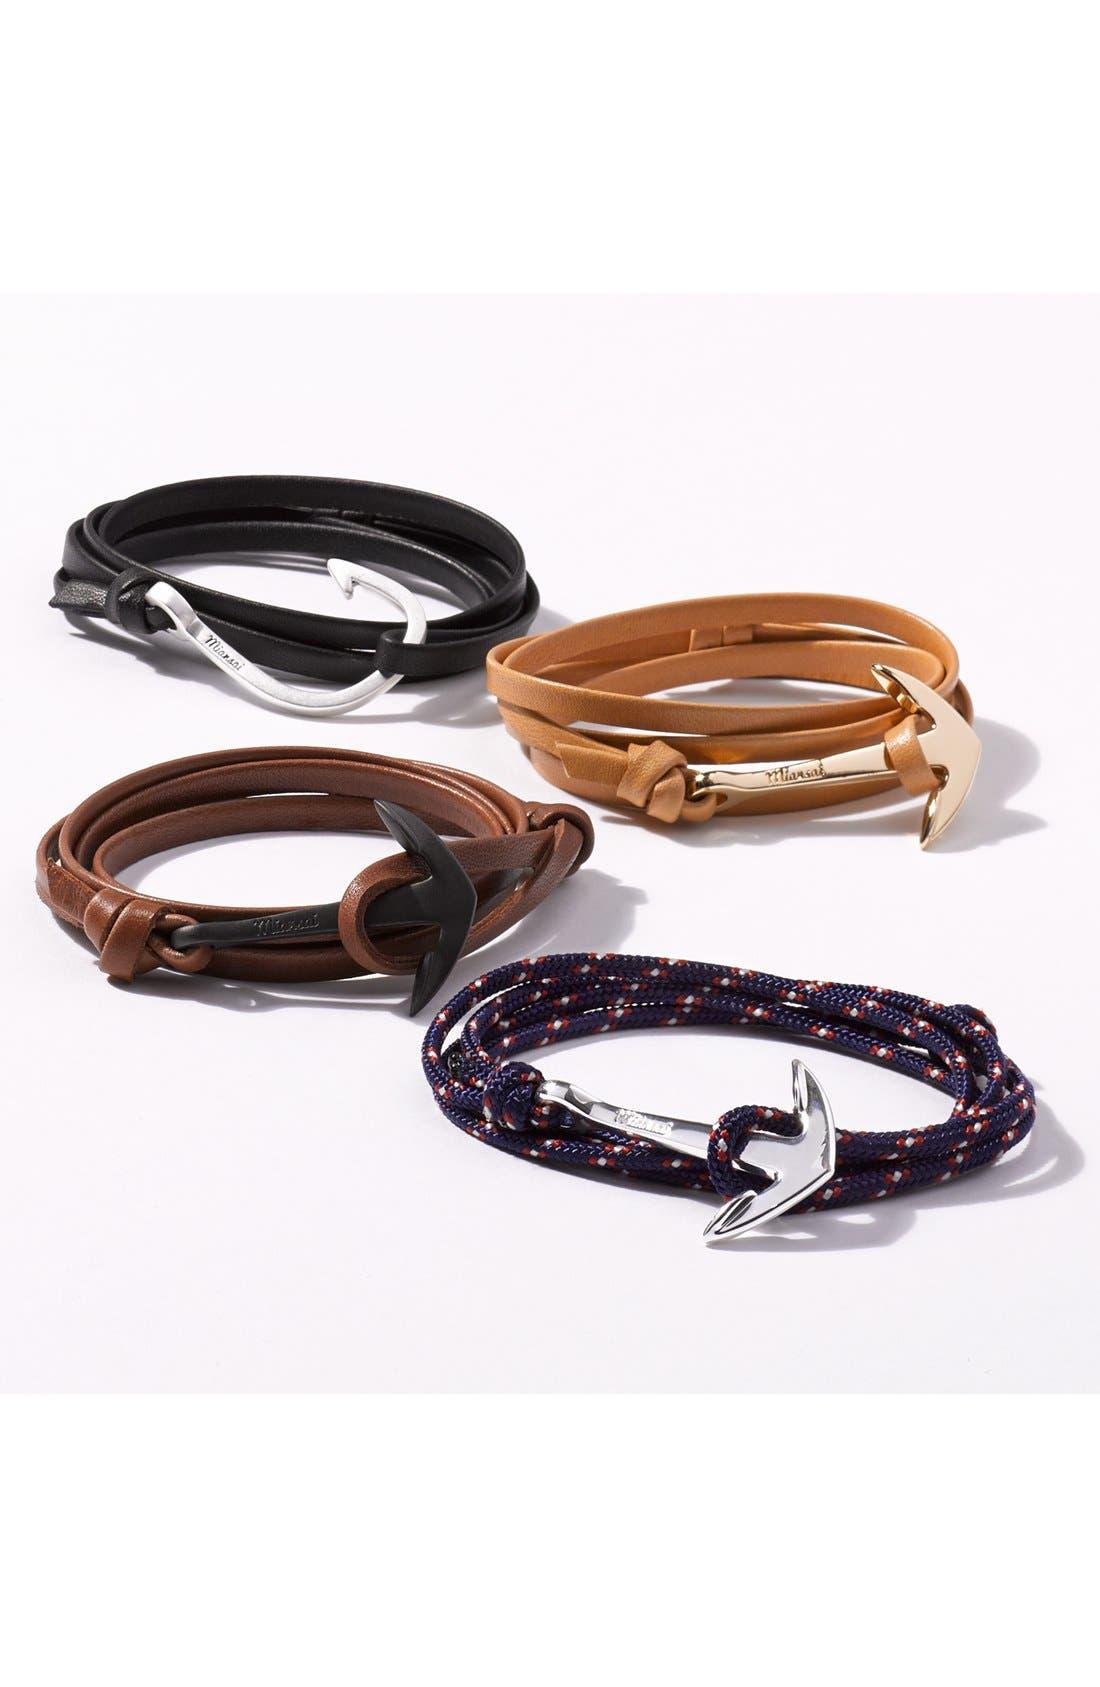 Silver Hook Leather Bracelet,                             Main thumbnail 1, color,                             410